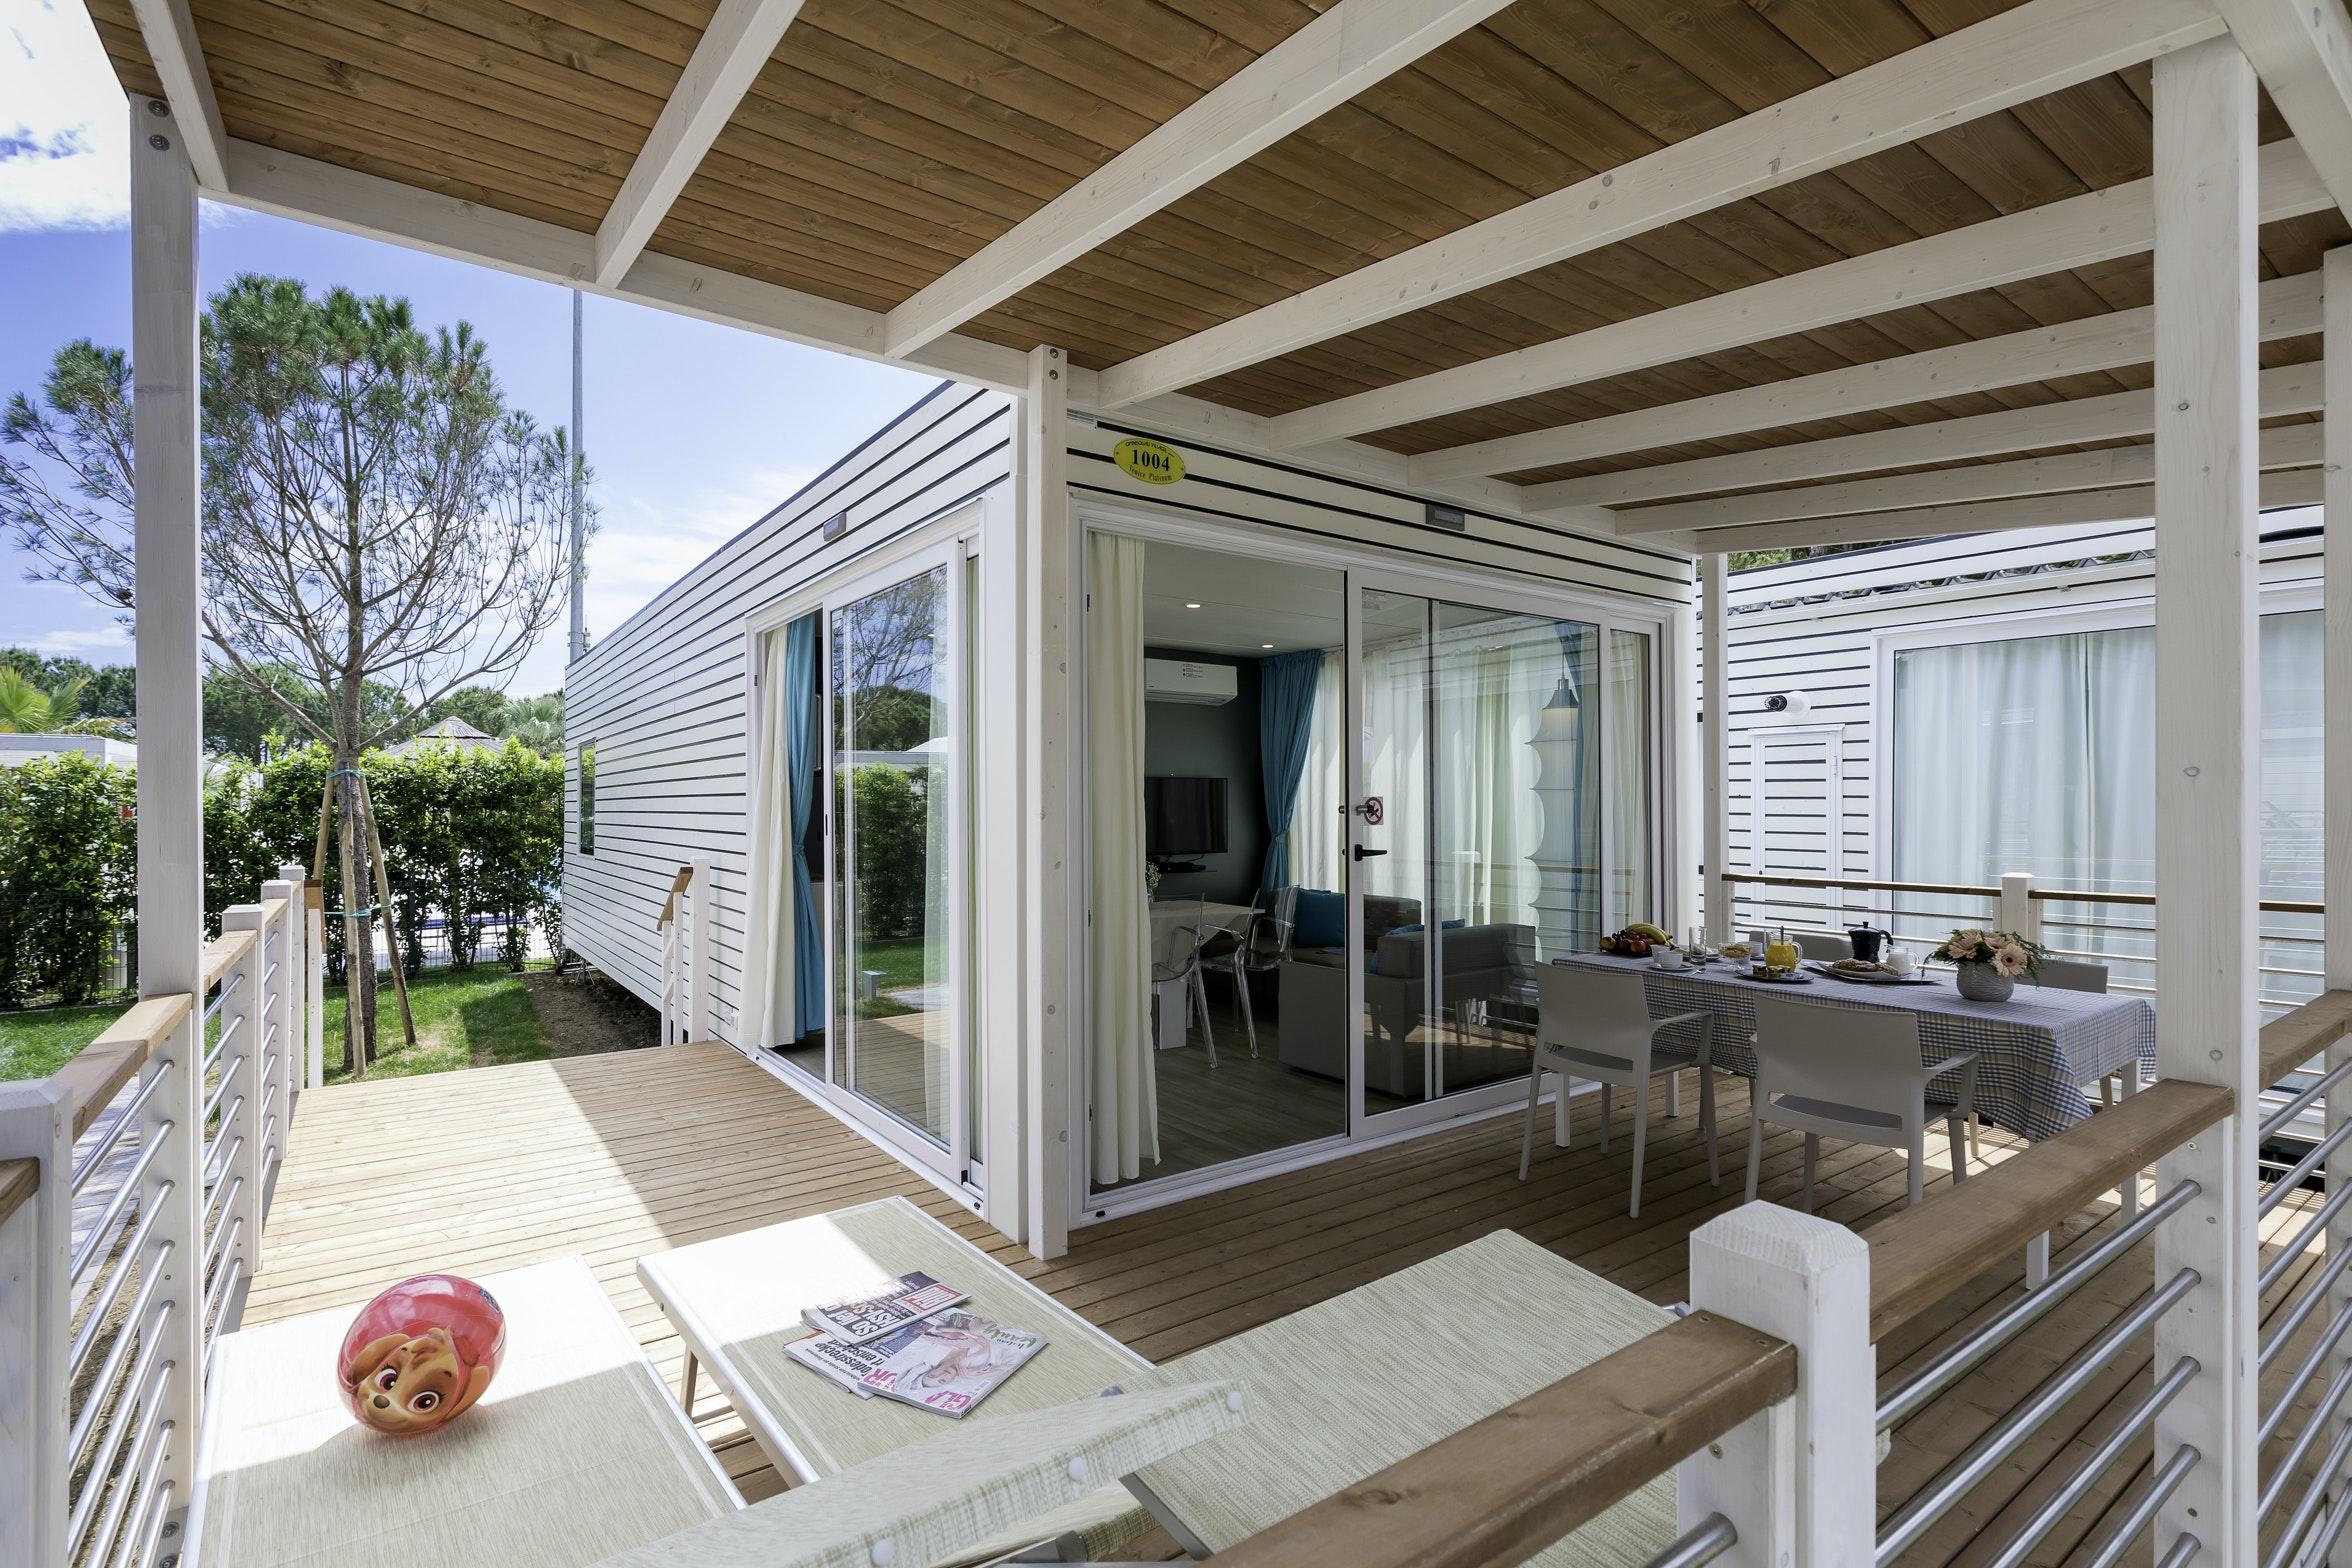 campingurlaub italien mobilheim camping tahiti italien. Black Bedroom Furniture Sets. Home Design Ideas